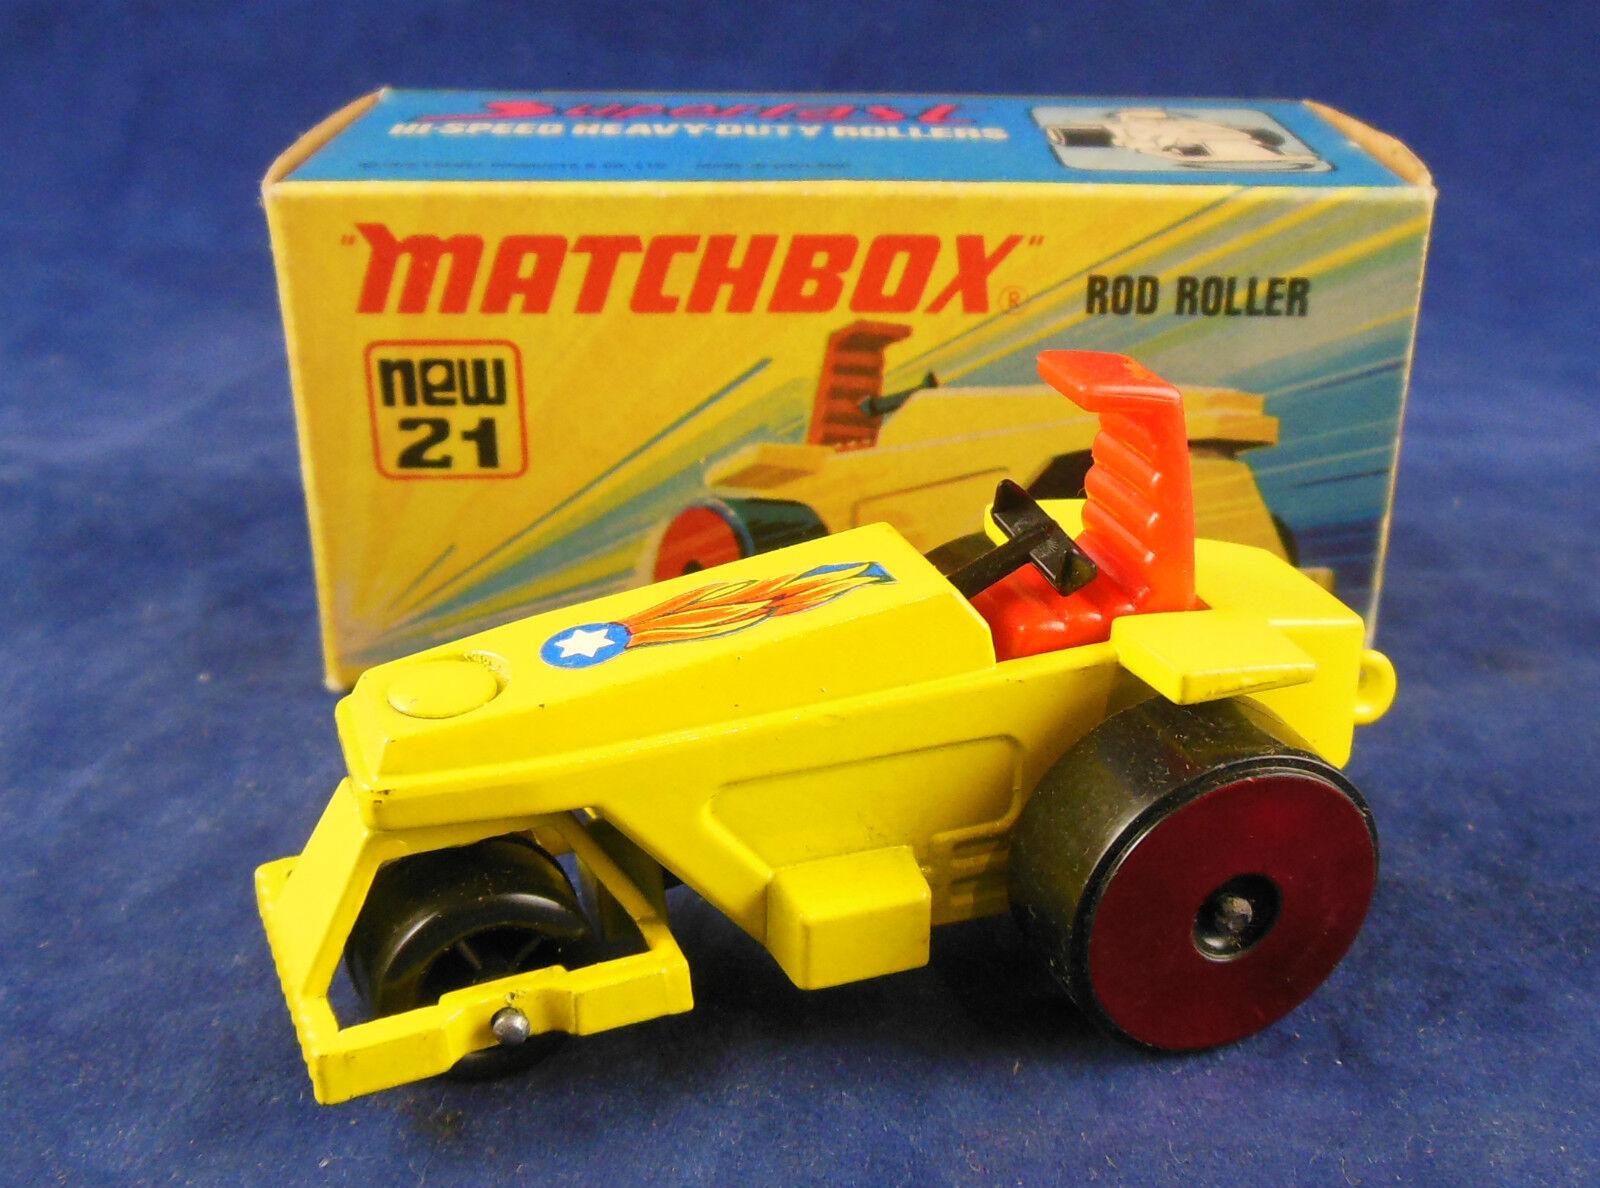 Scarce red wheels Matchbox Superfast No.21b Rod Roller in Yellow  near MIB